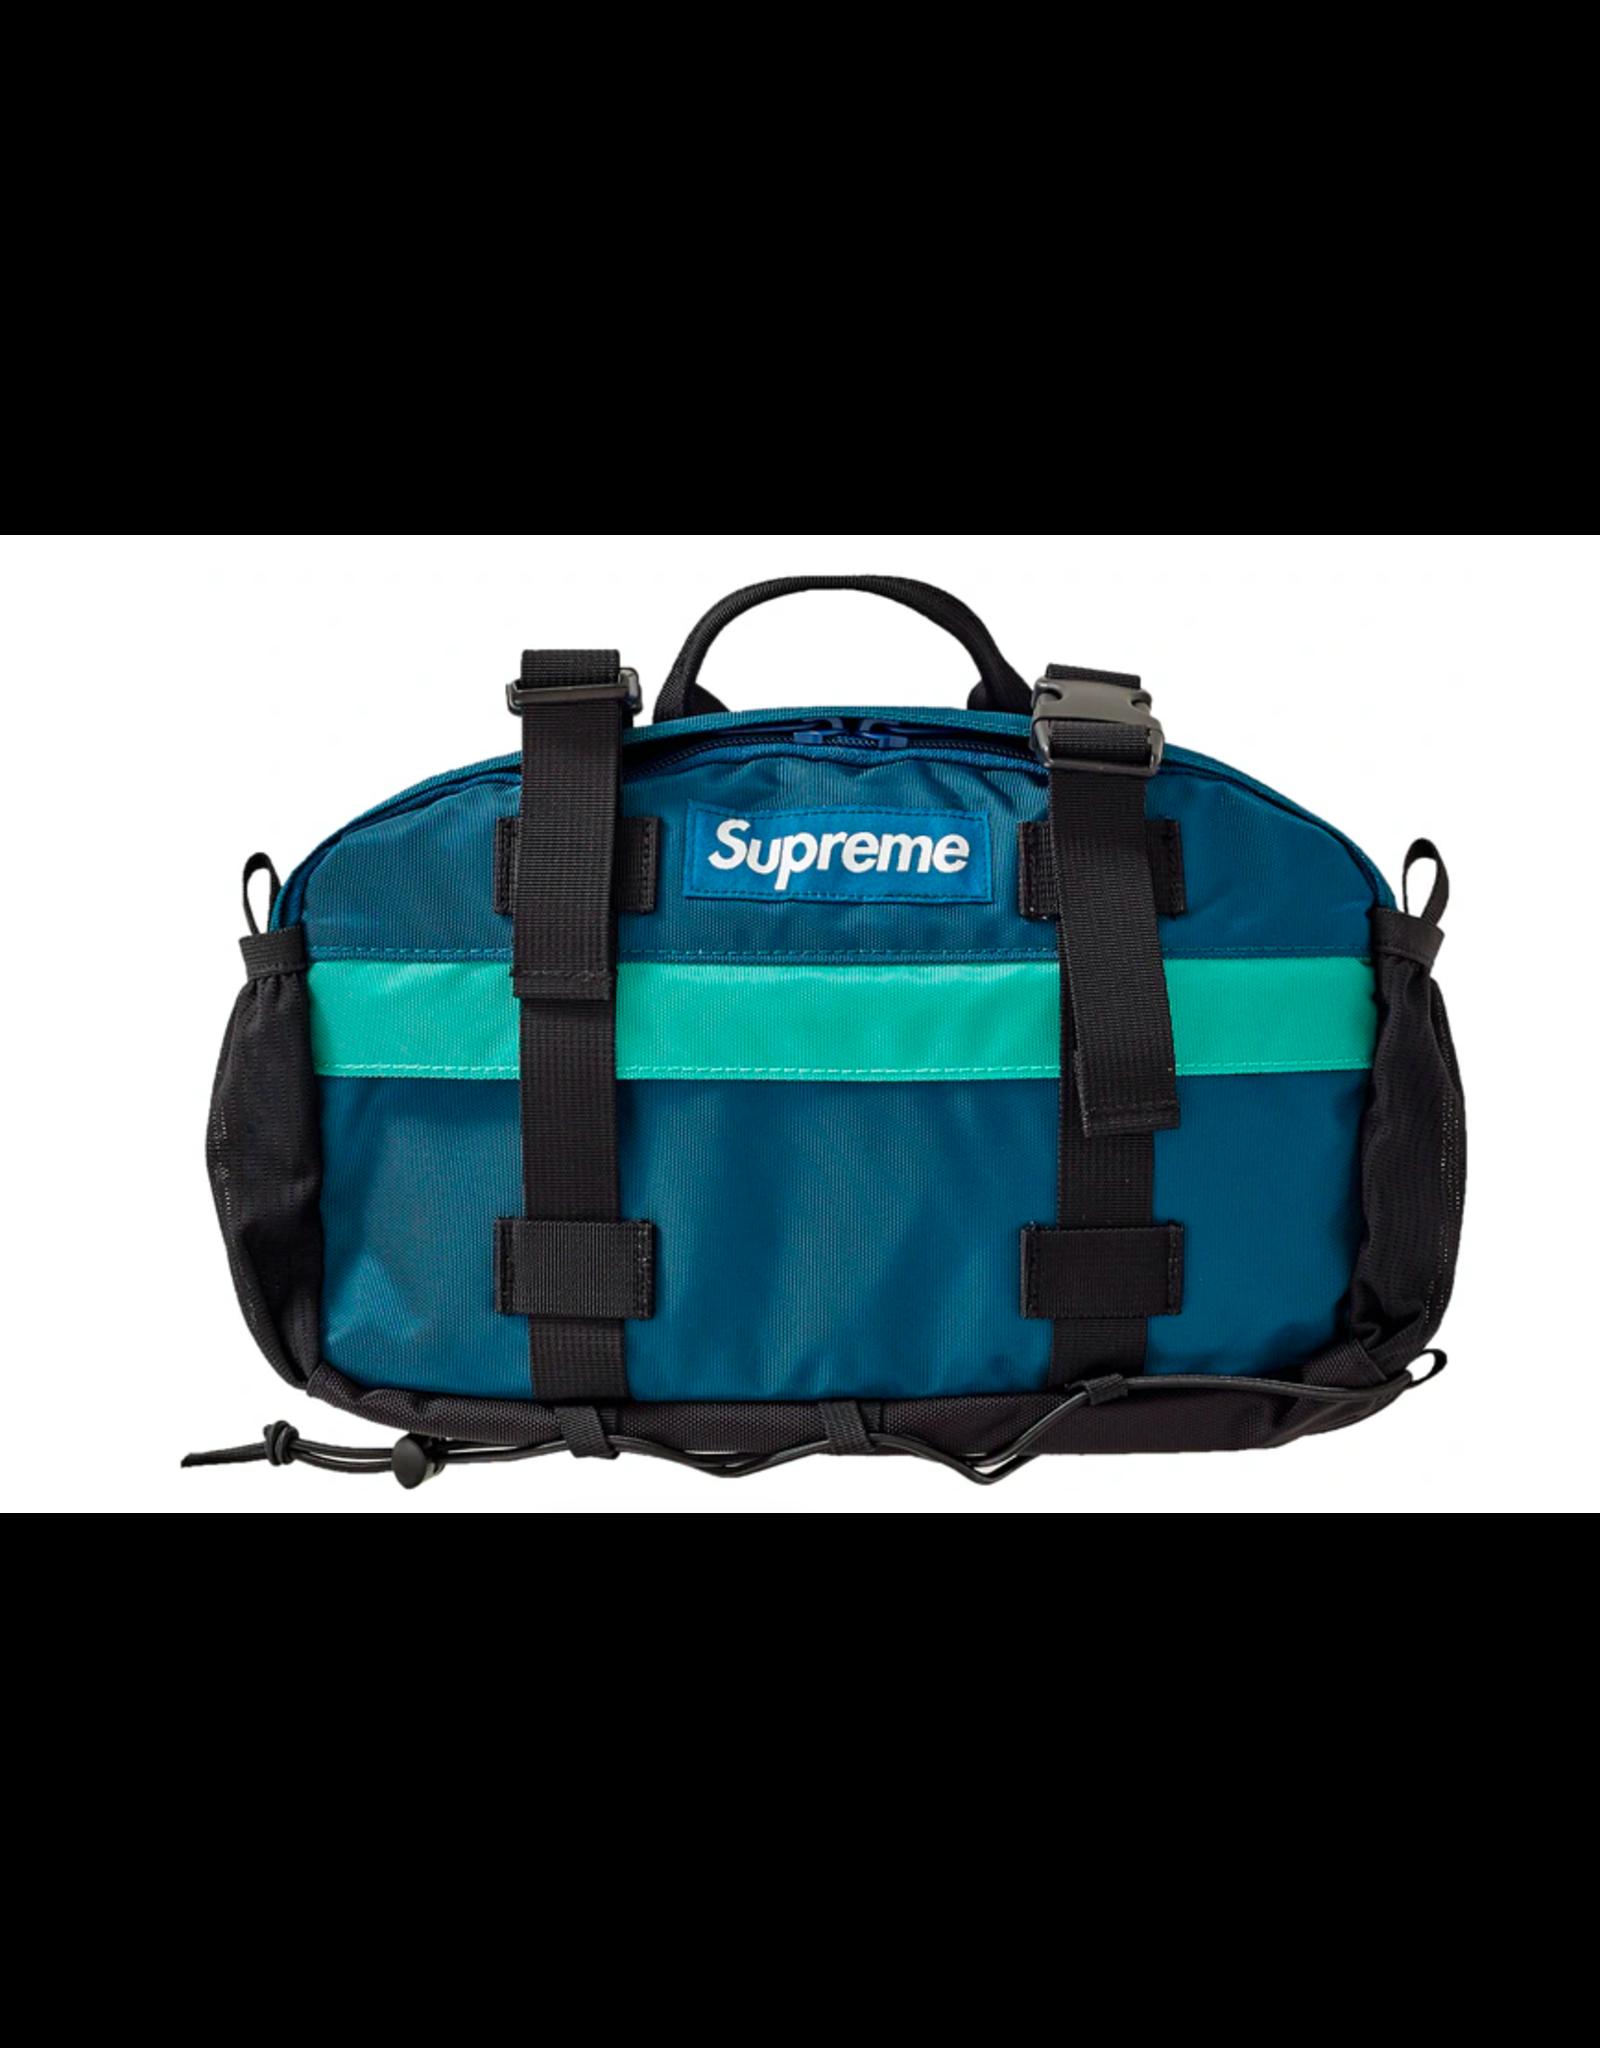 SUPREME Supreme Waist Bag (FW19) Dark Teal